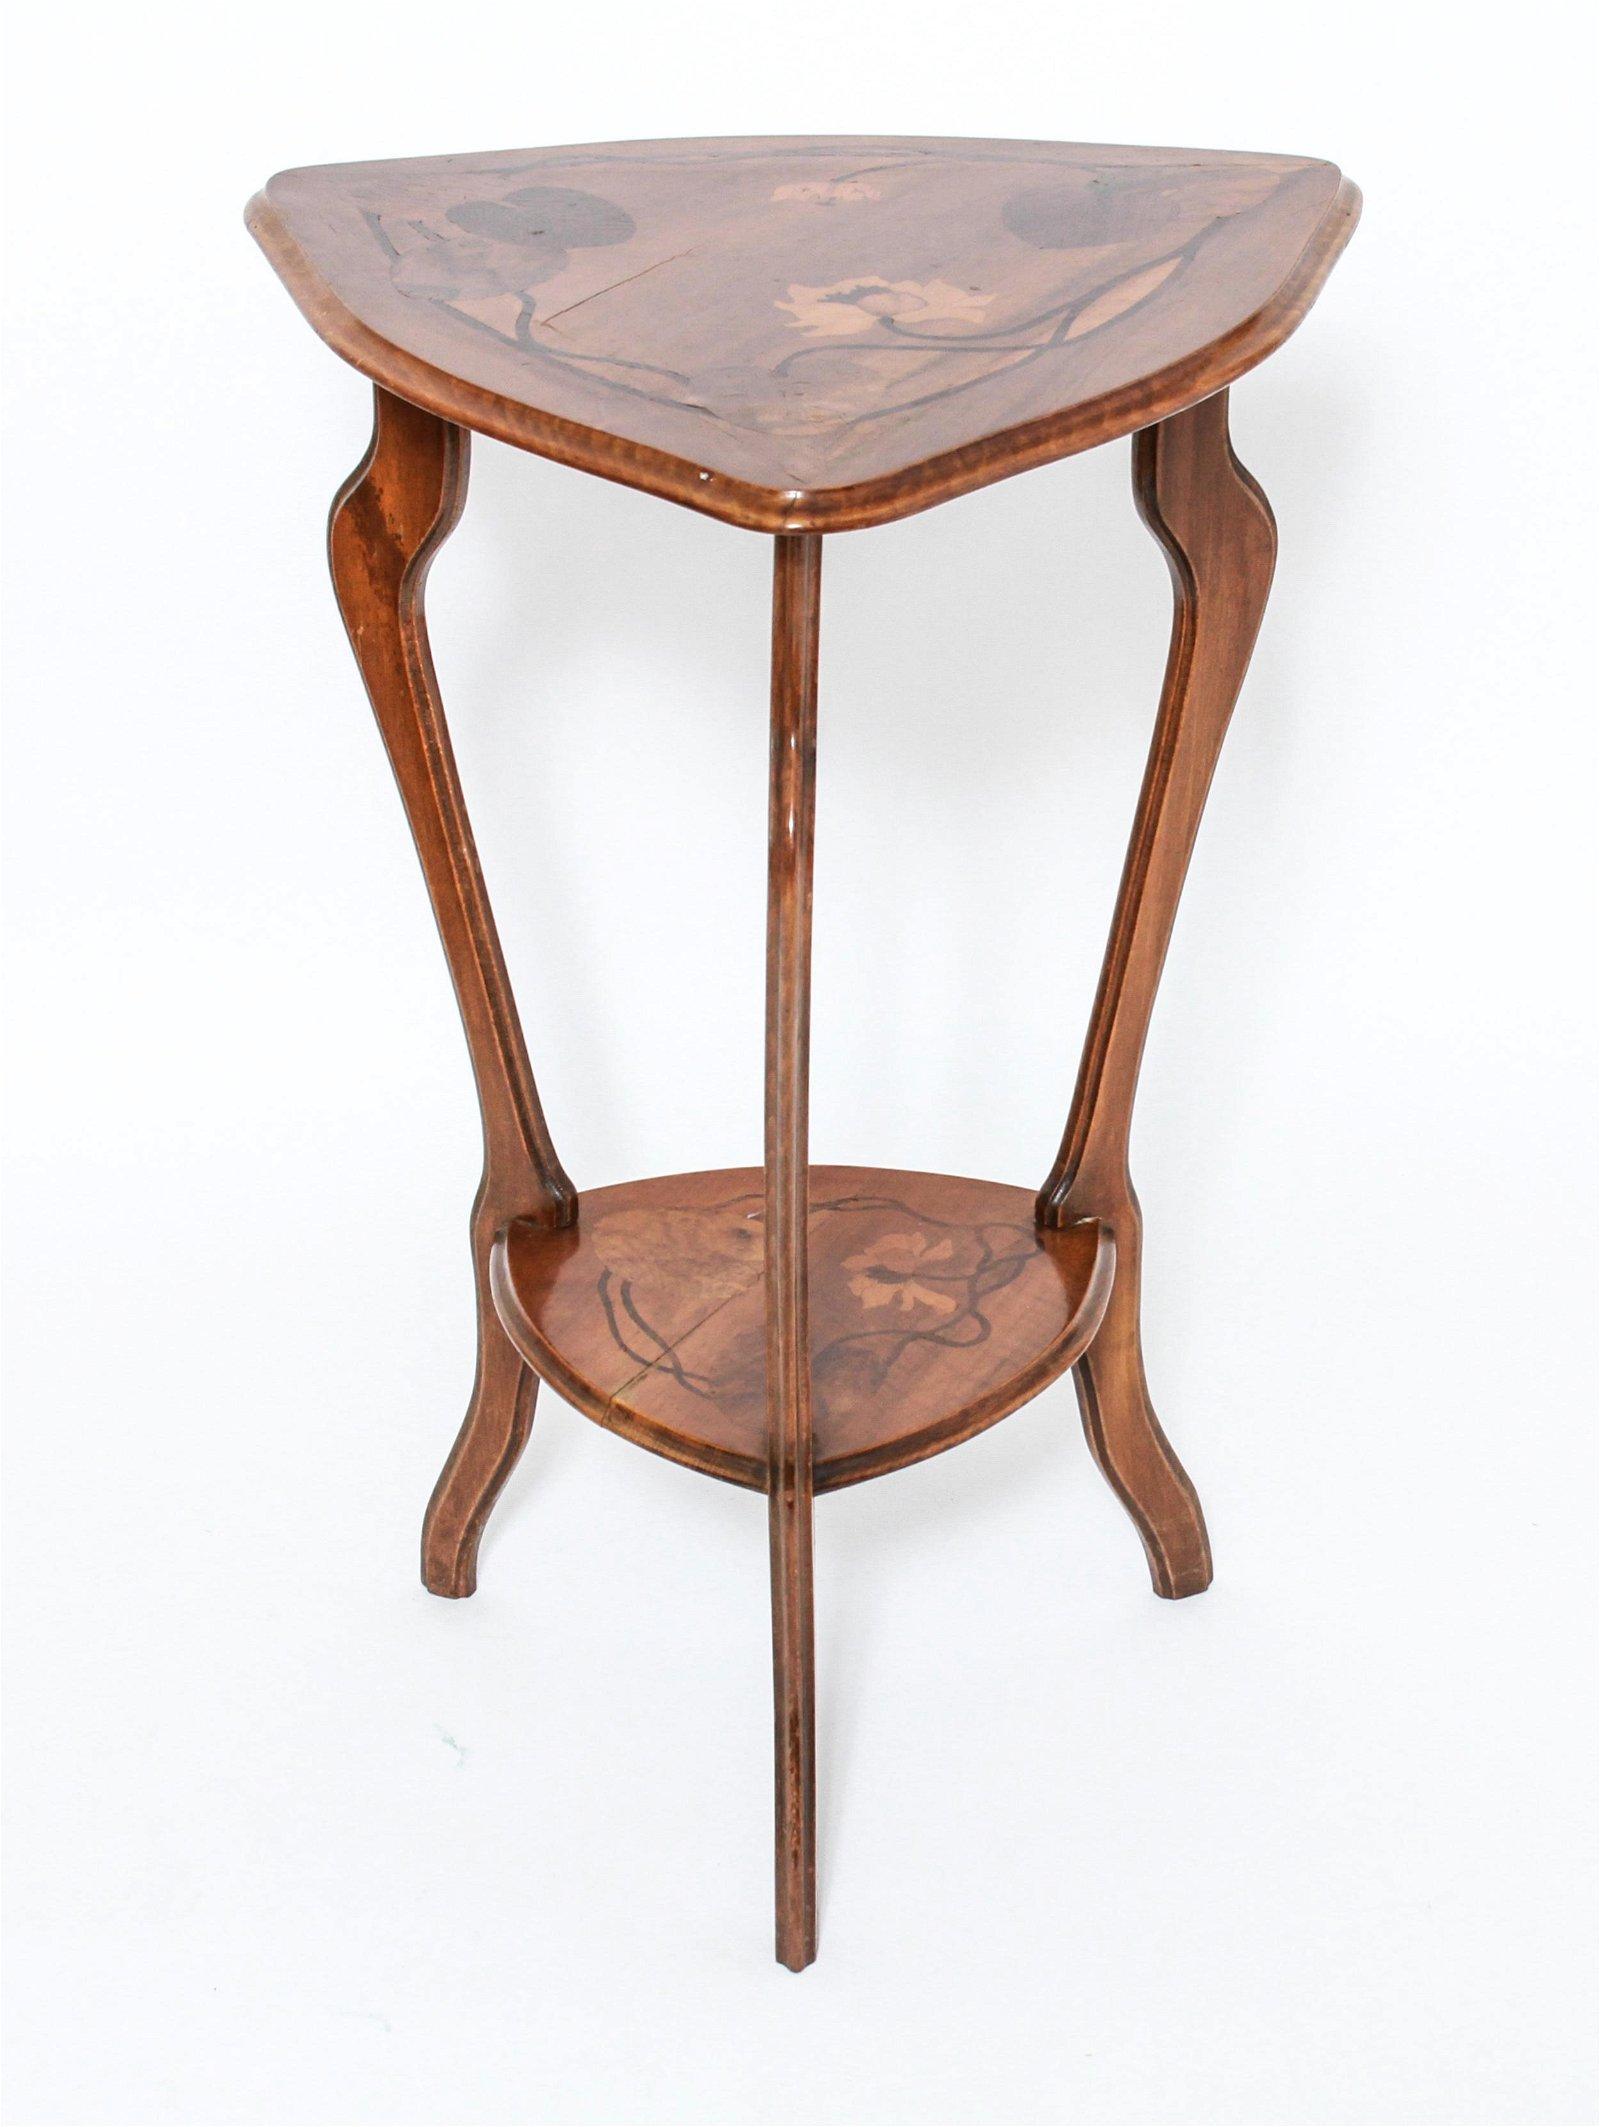 Paul Guth Art Nouveau Marquetry Tripod Table